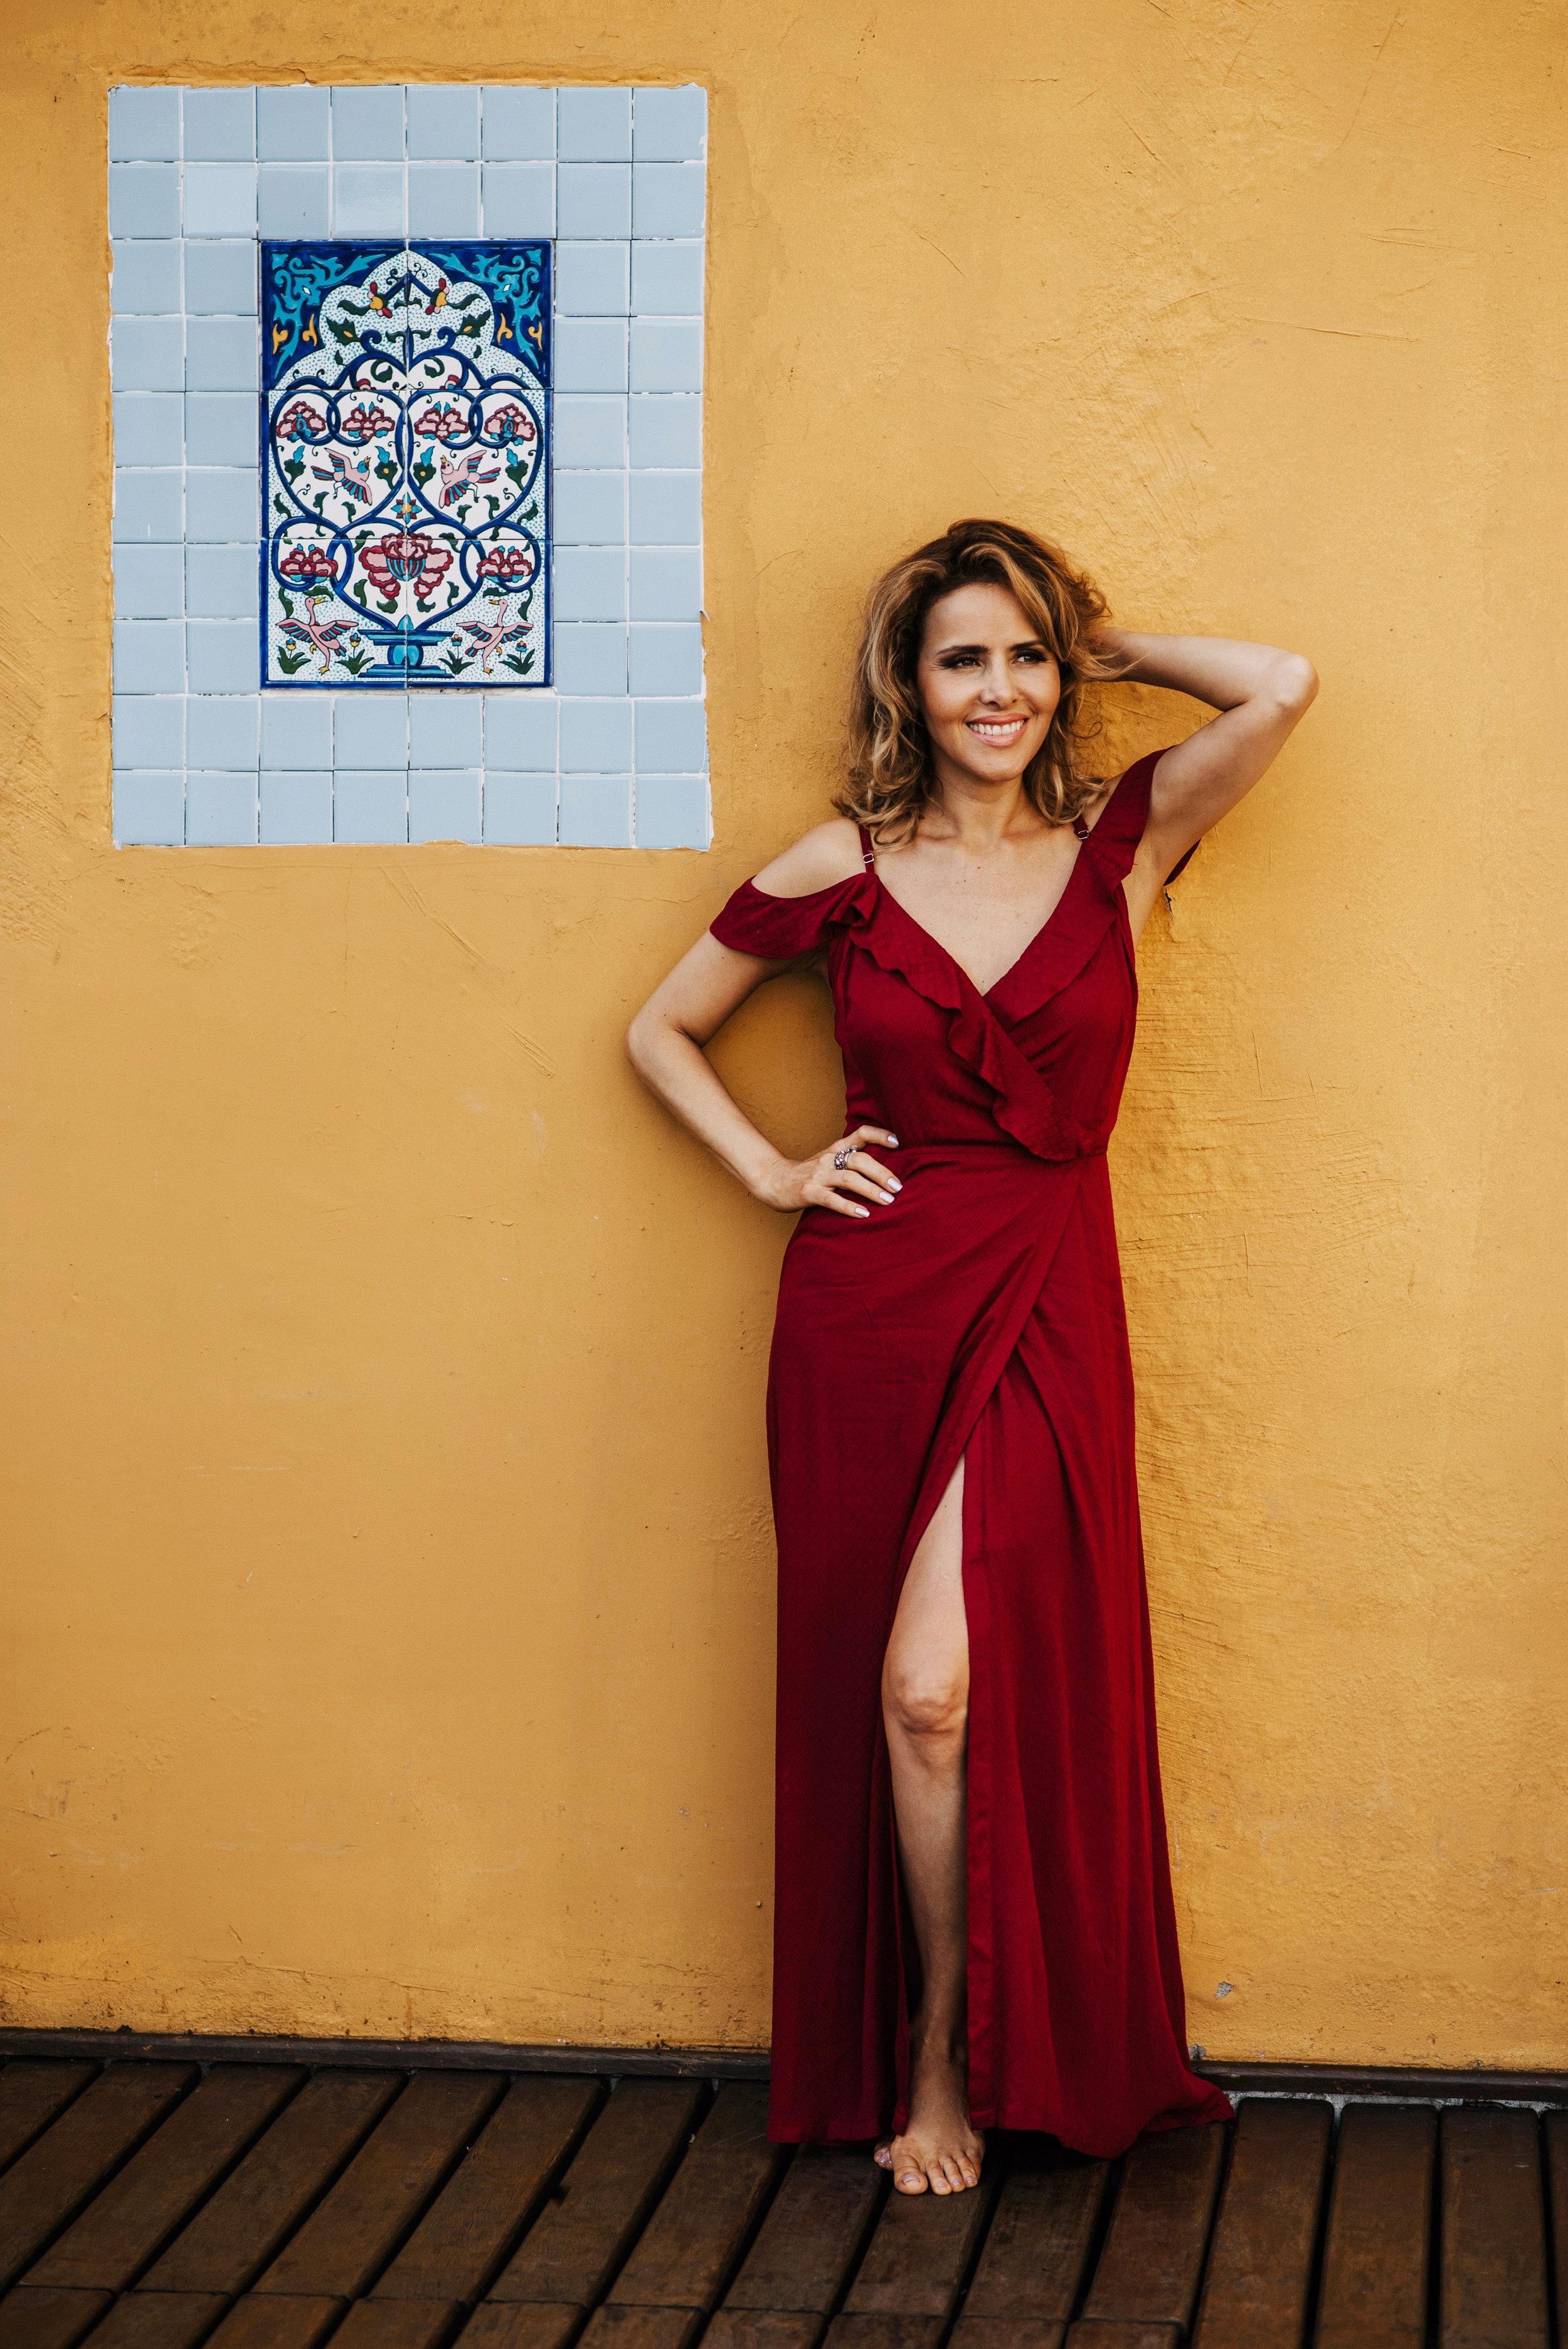 leona cavalli fotos atriz famosos fotografa rio de janeiro moda editorial modefotografie modefotograf fashion photographer munich germany münchen brazil brasil